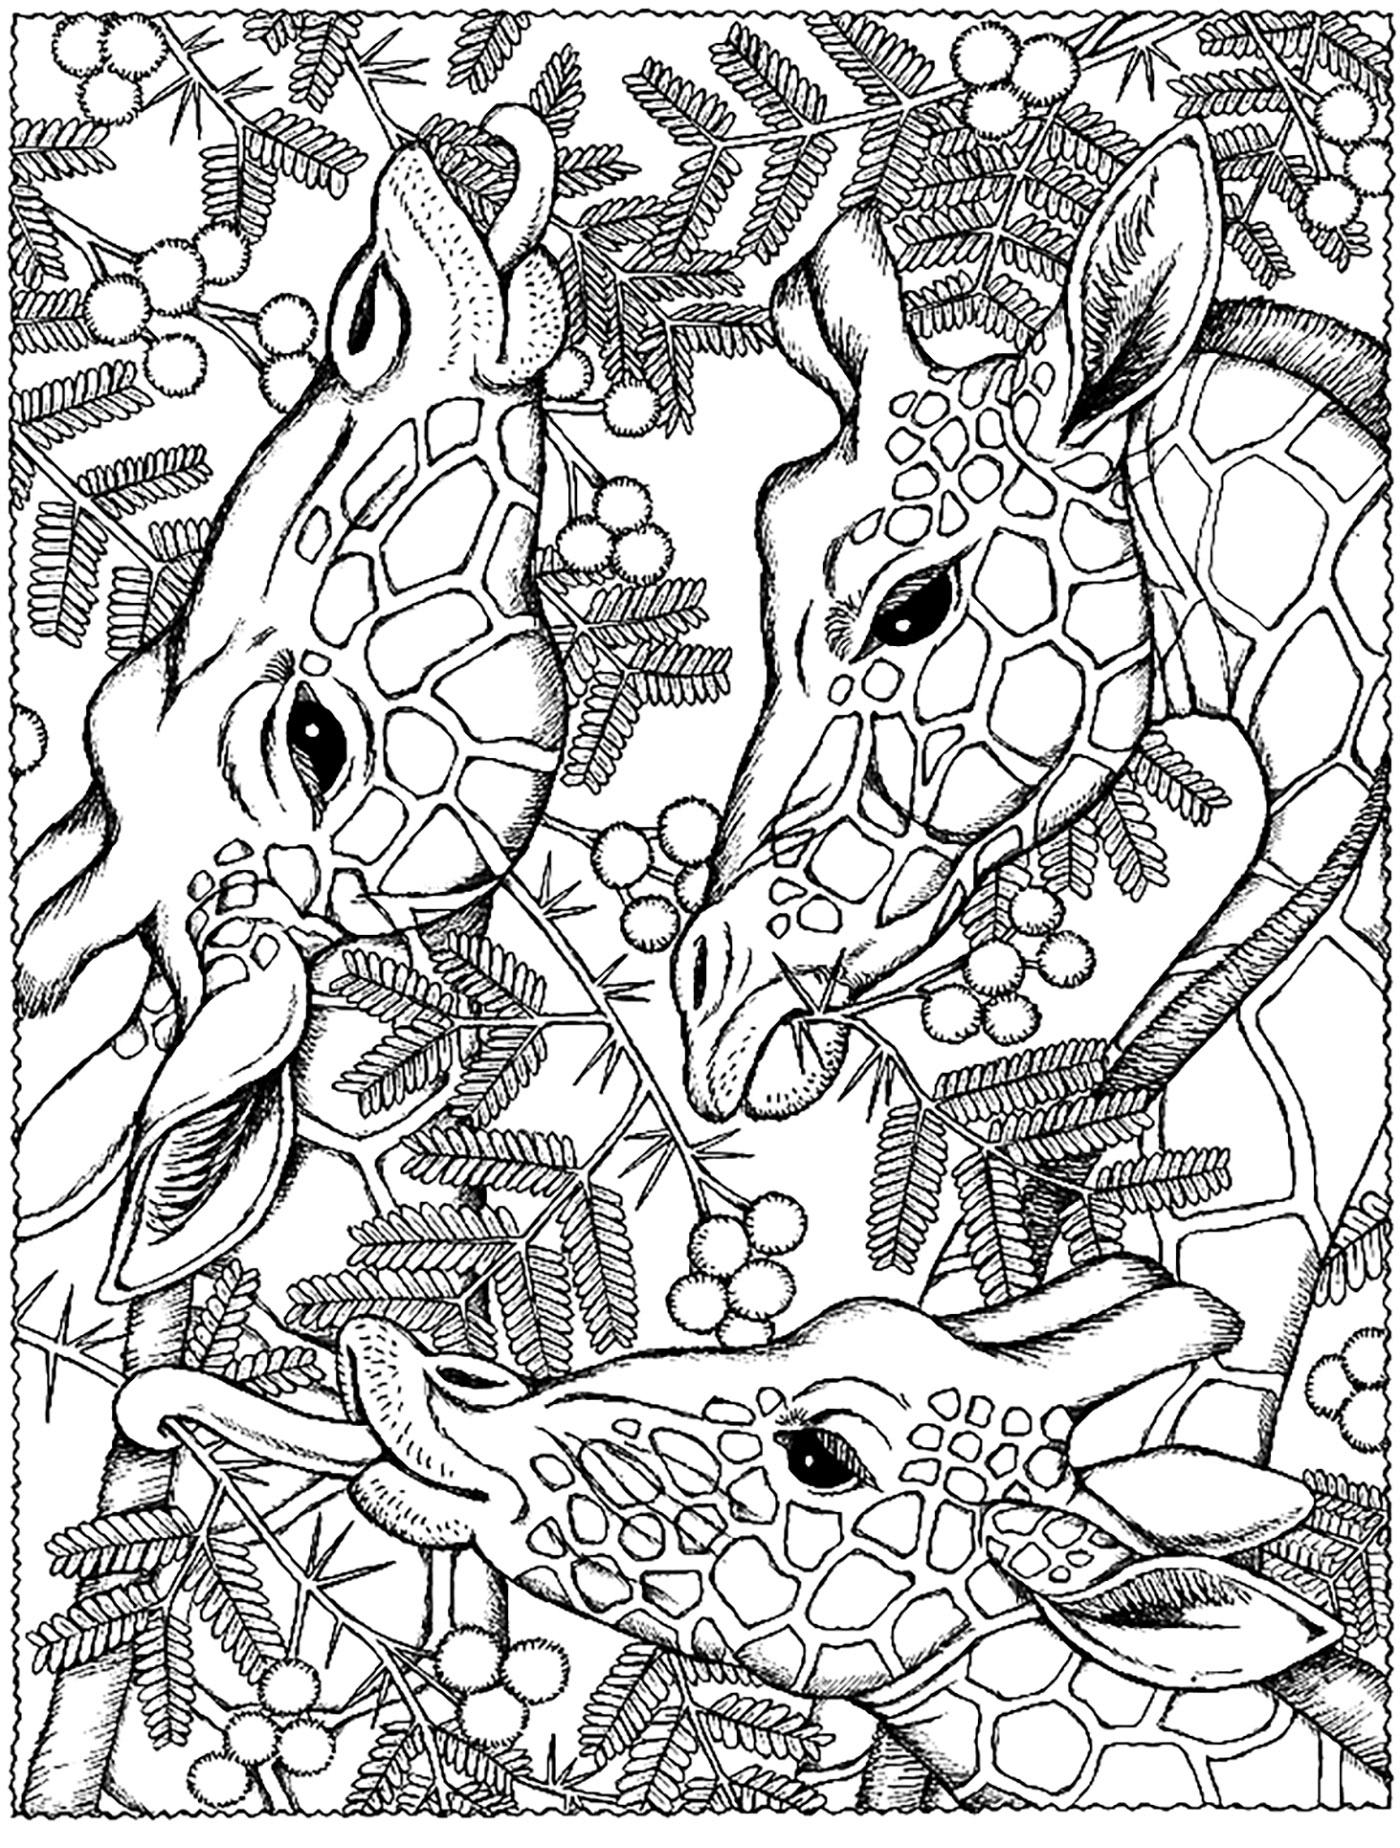 Giraffen 45670 - Giraffen - Malbuch Fur Erwachsene